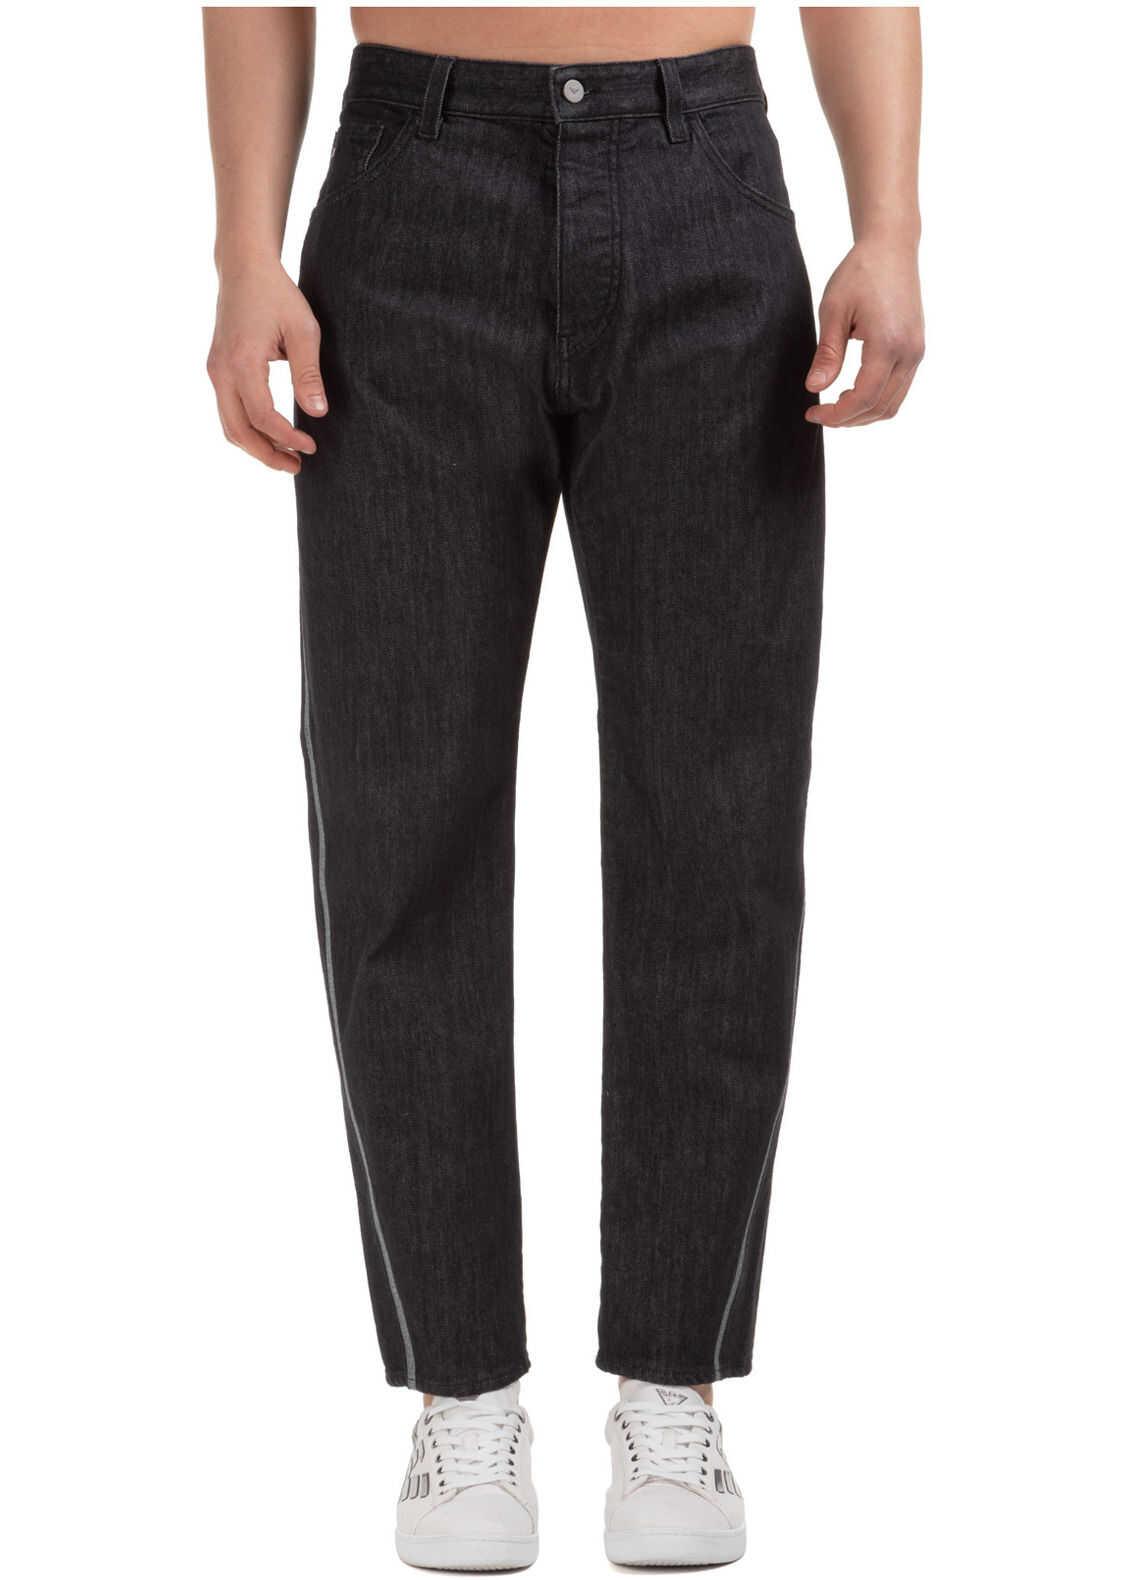 Emporio Armani Jeans Denim Black